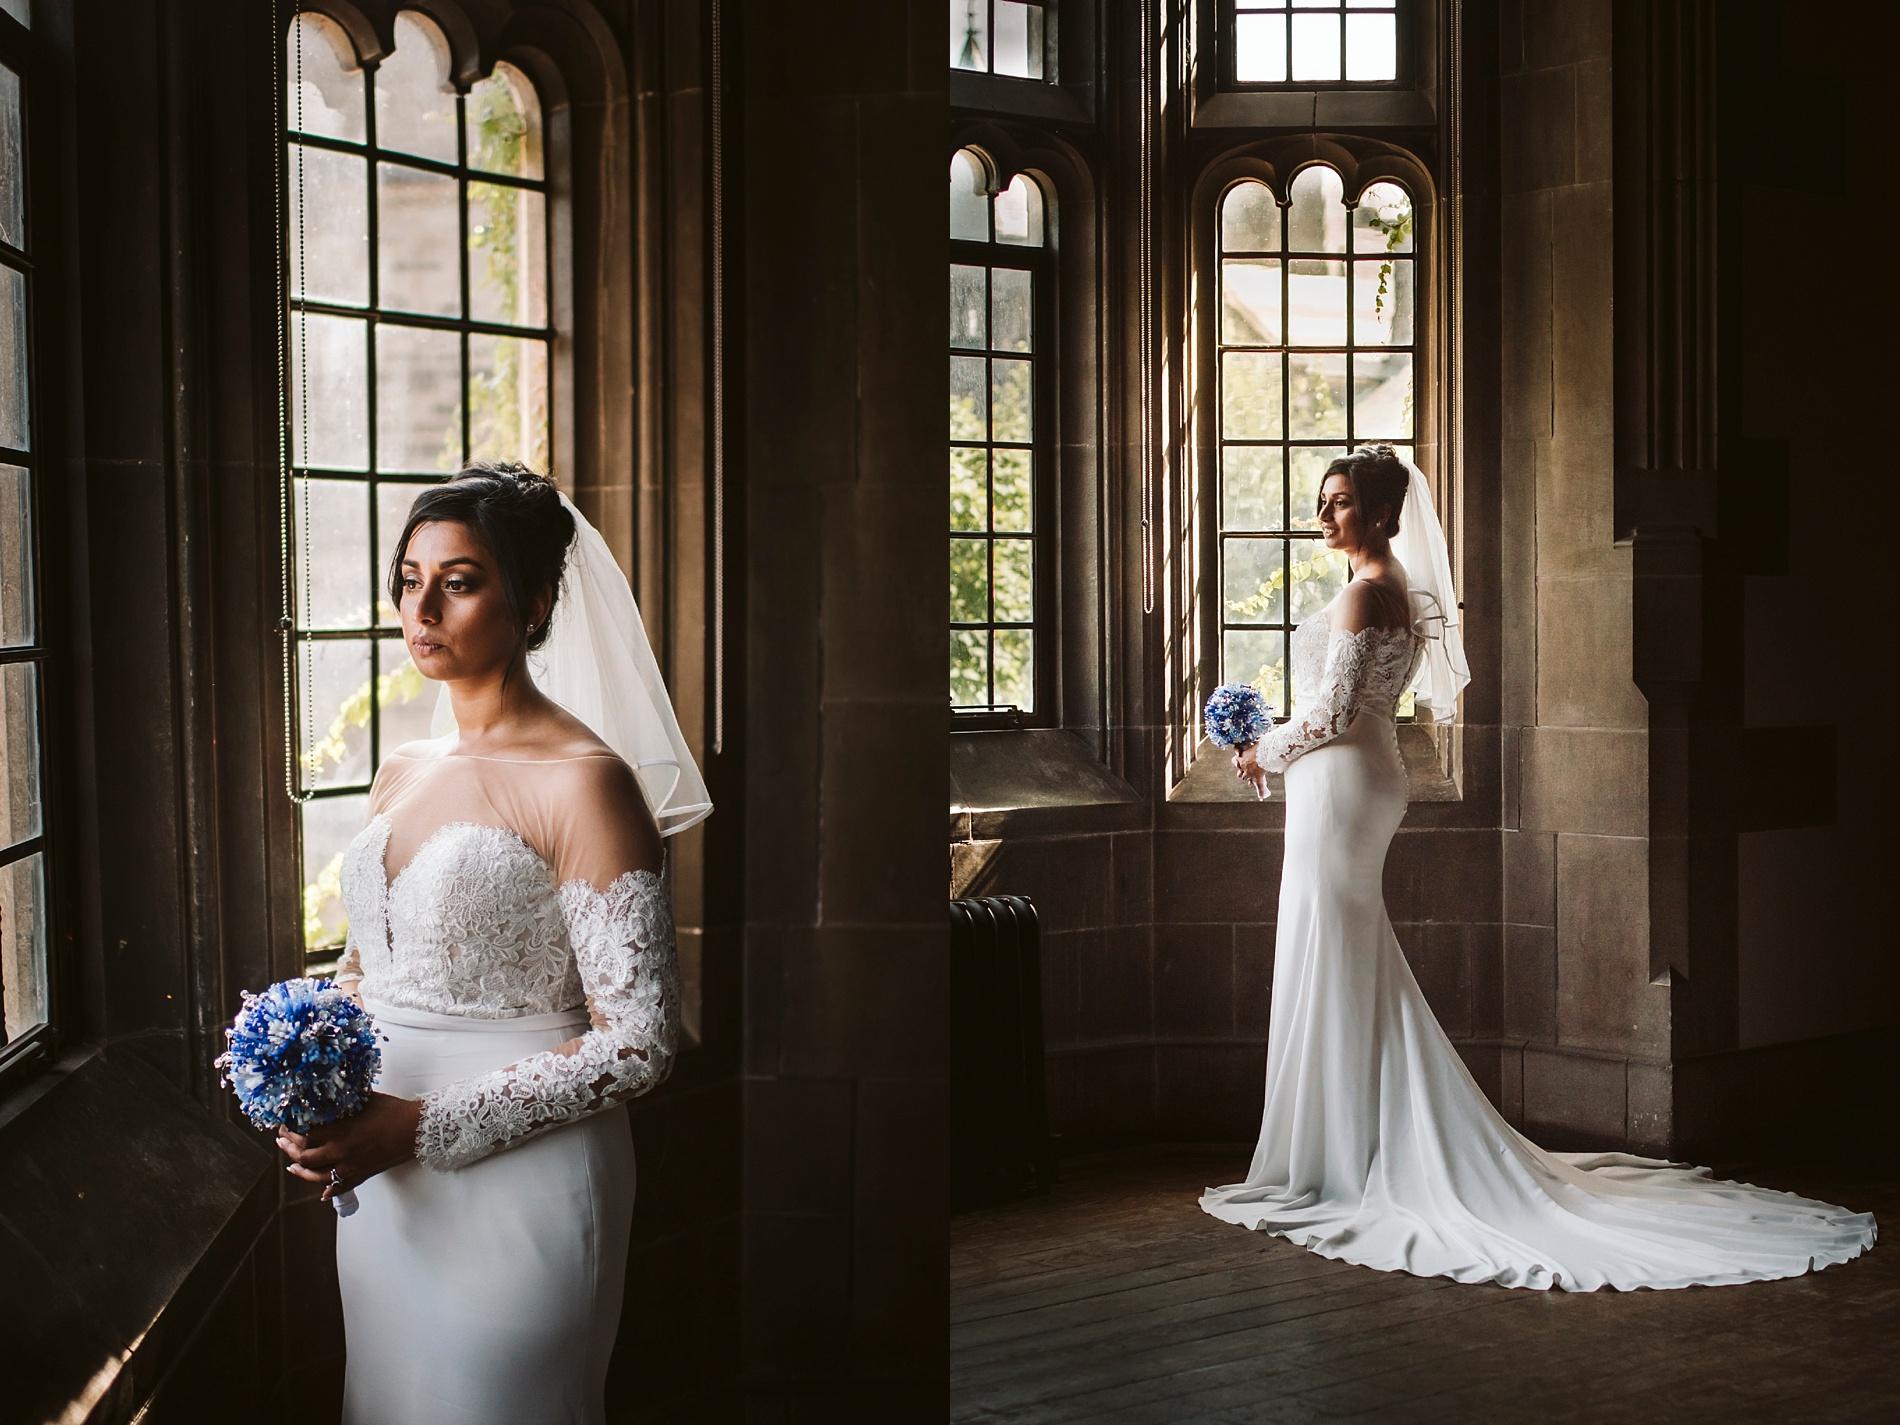 Eglington_Grand_Wedding_Photographer_0055.jpg